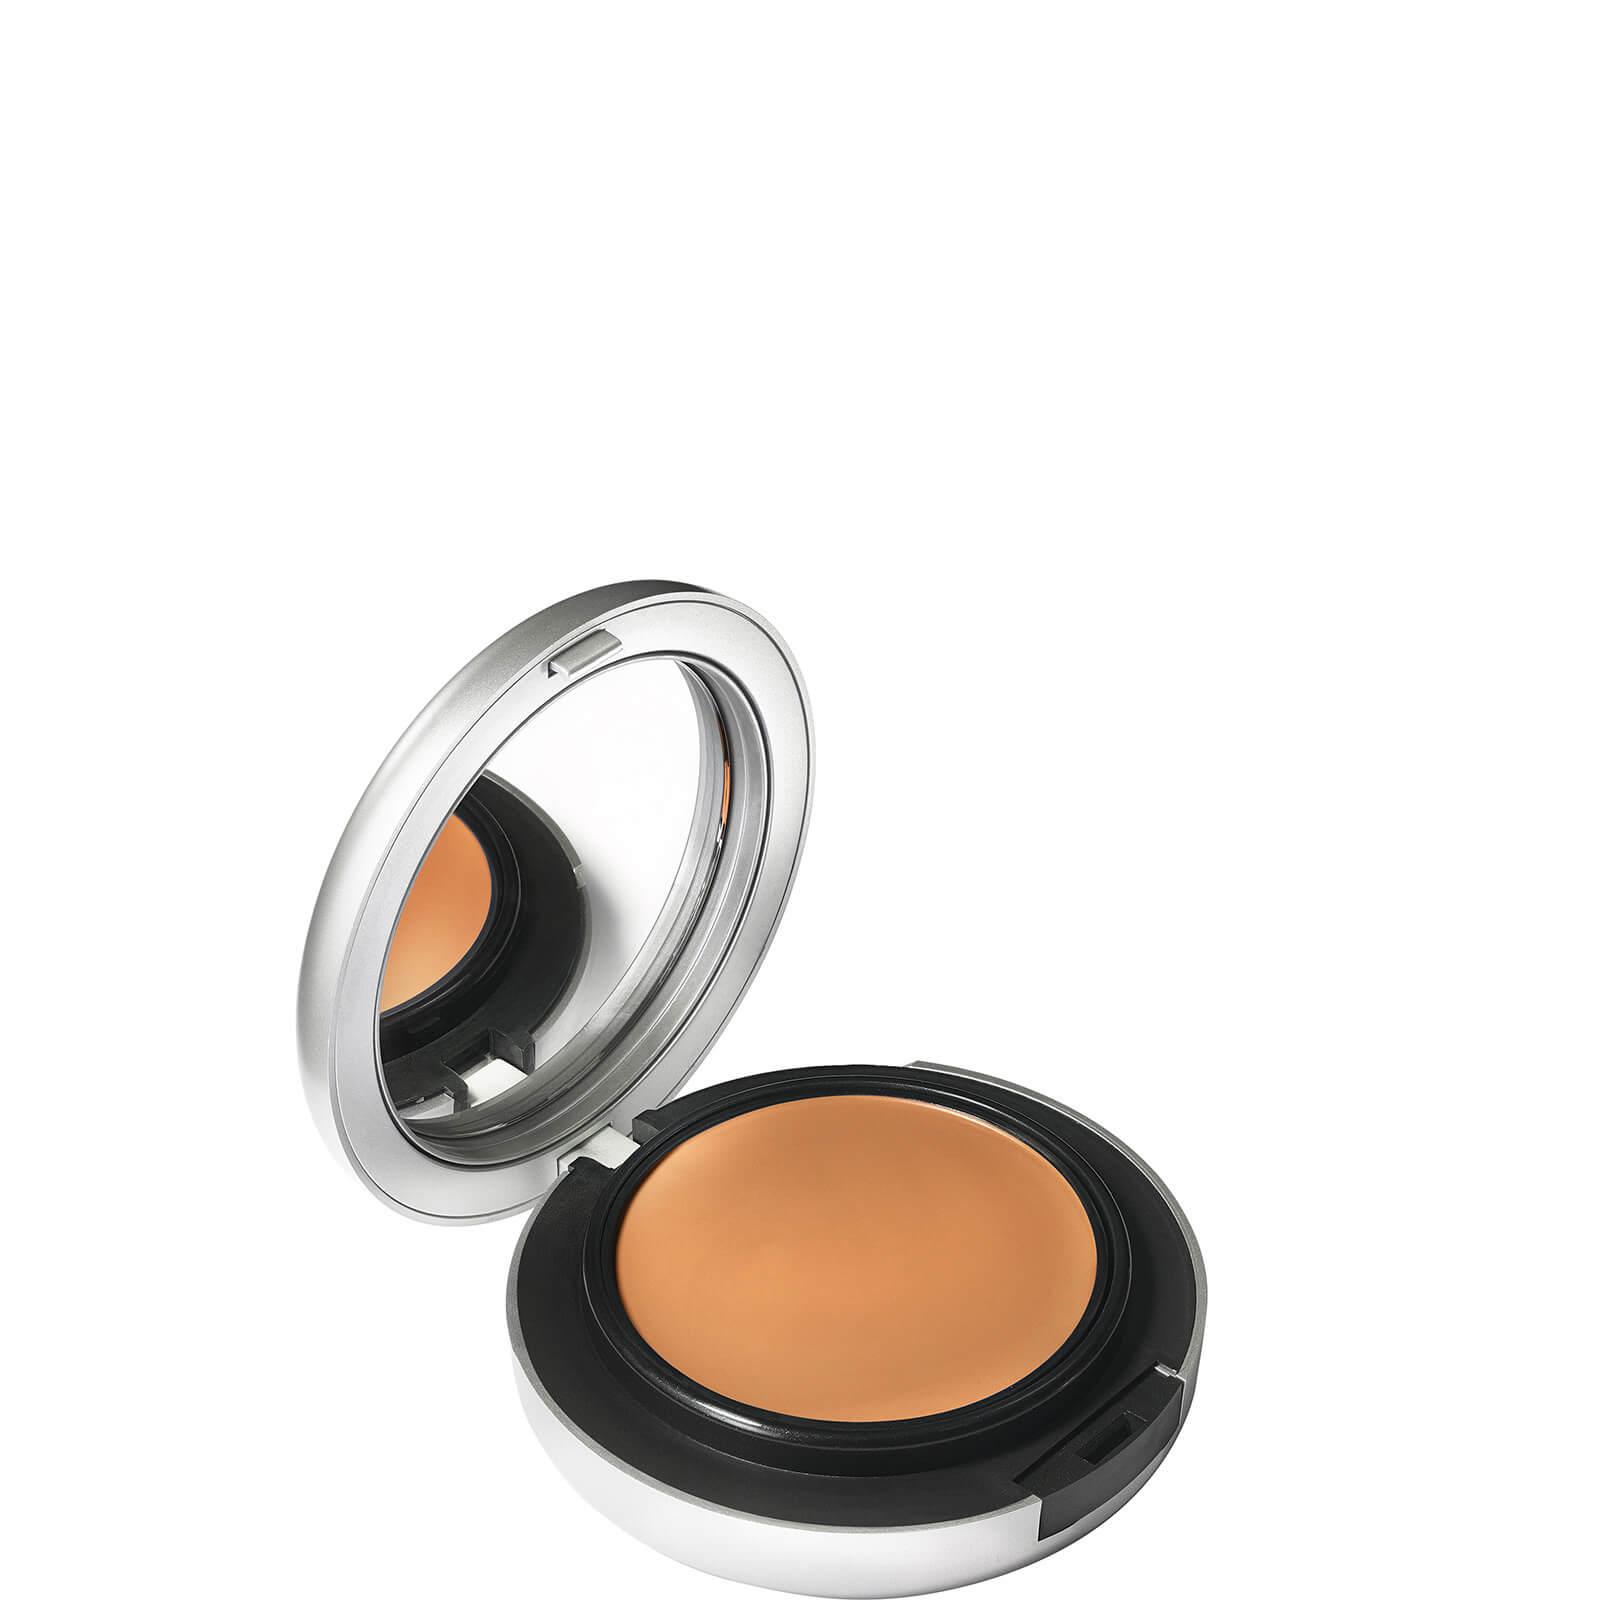 MAC Studio Fix Tech Cream-to-Powder Foundation 10g (Various Shades) - C4.5